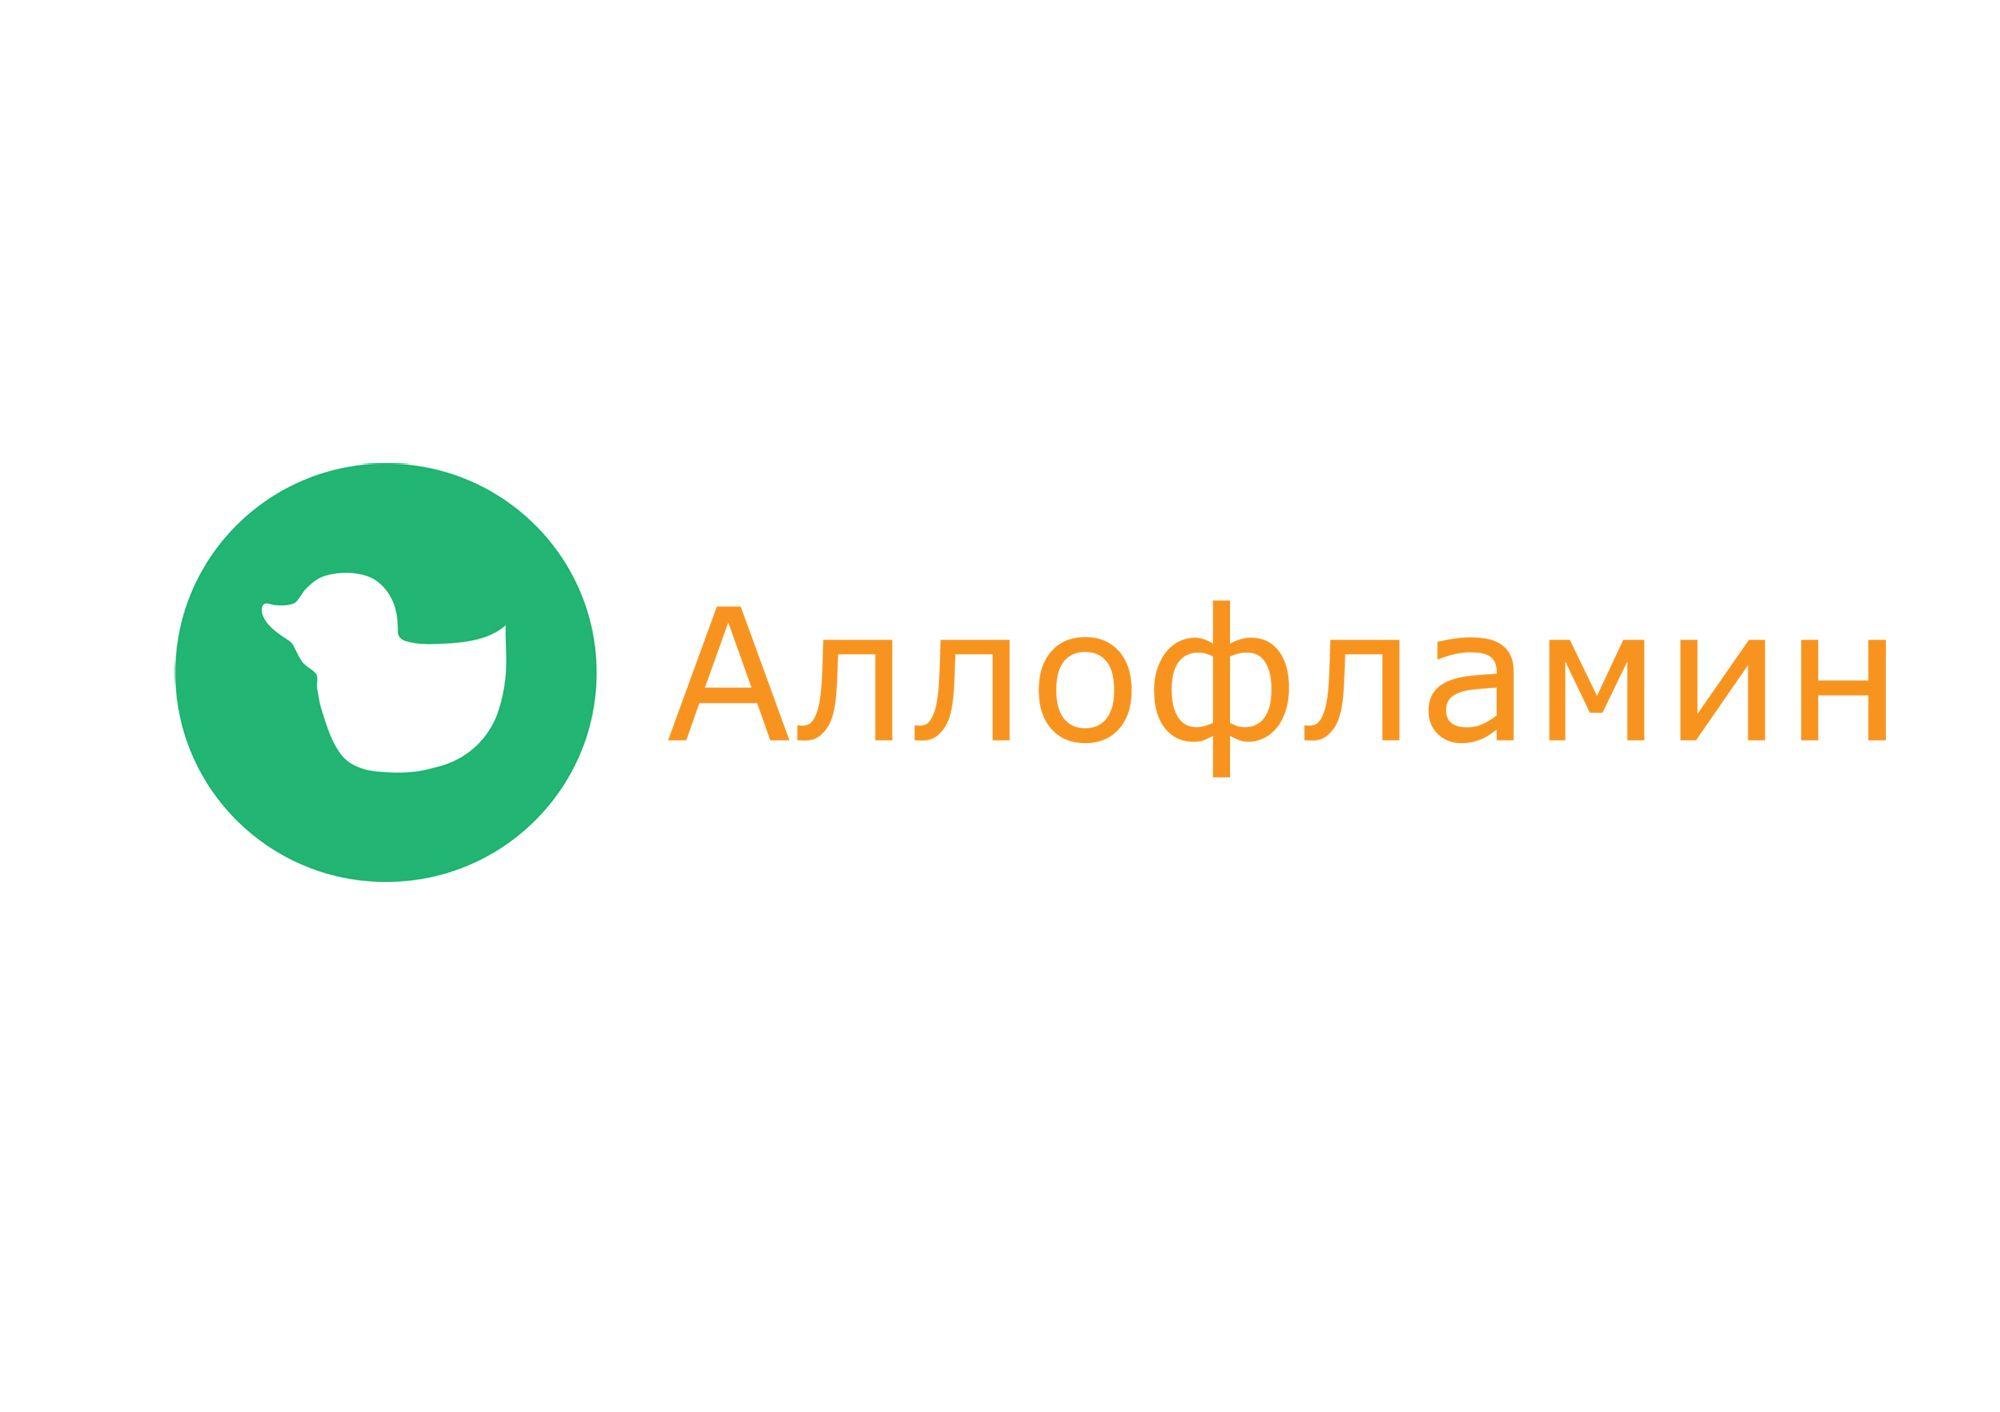 Логотип препарата Аллофламин - дизайнер BegunMaria